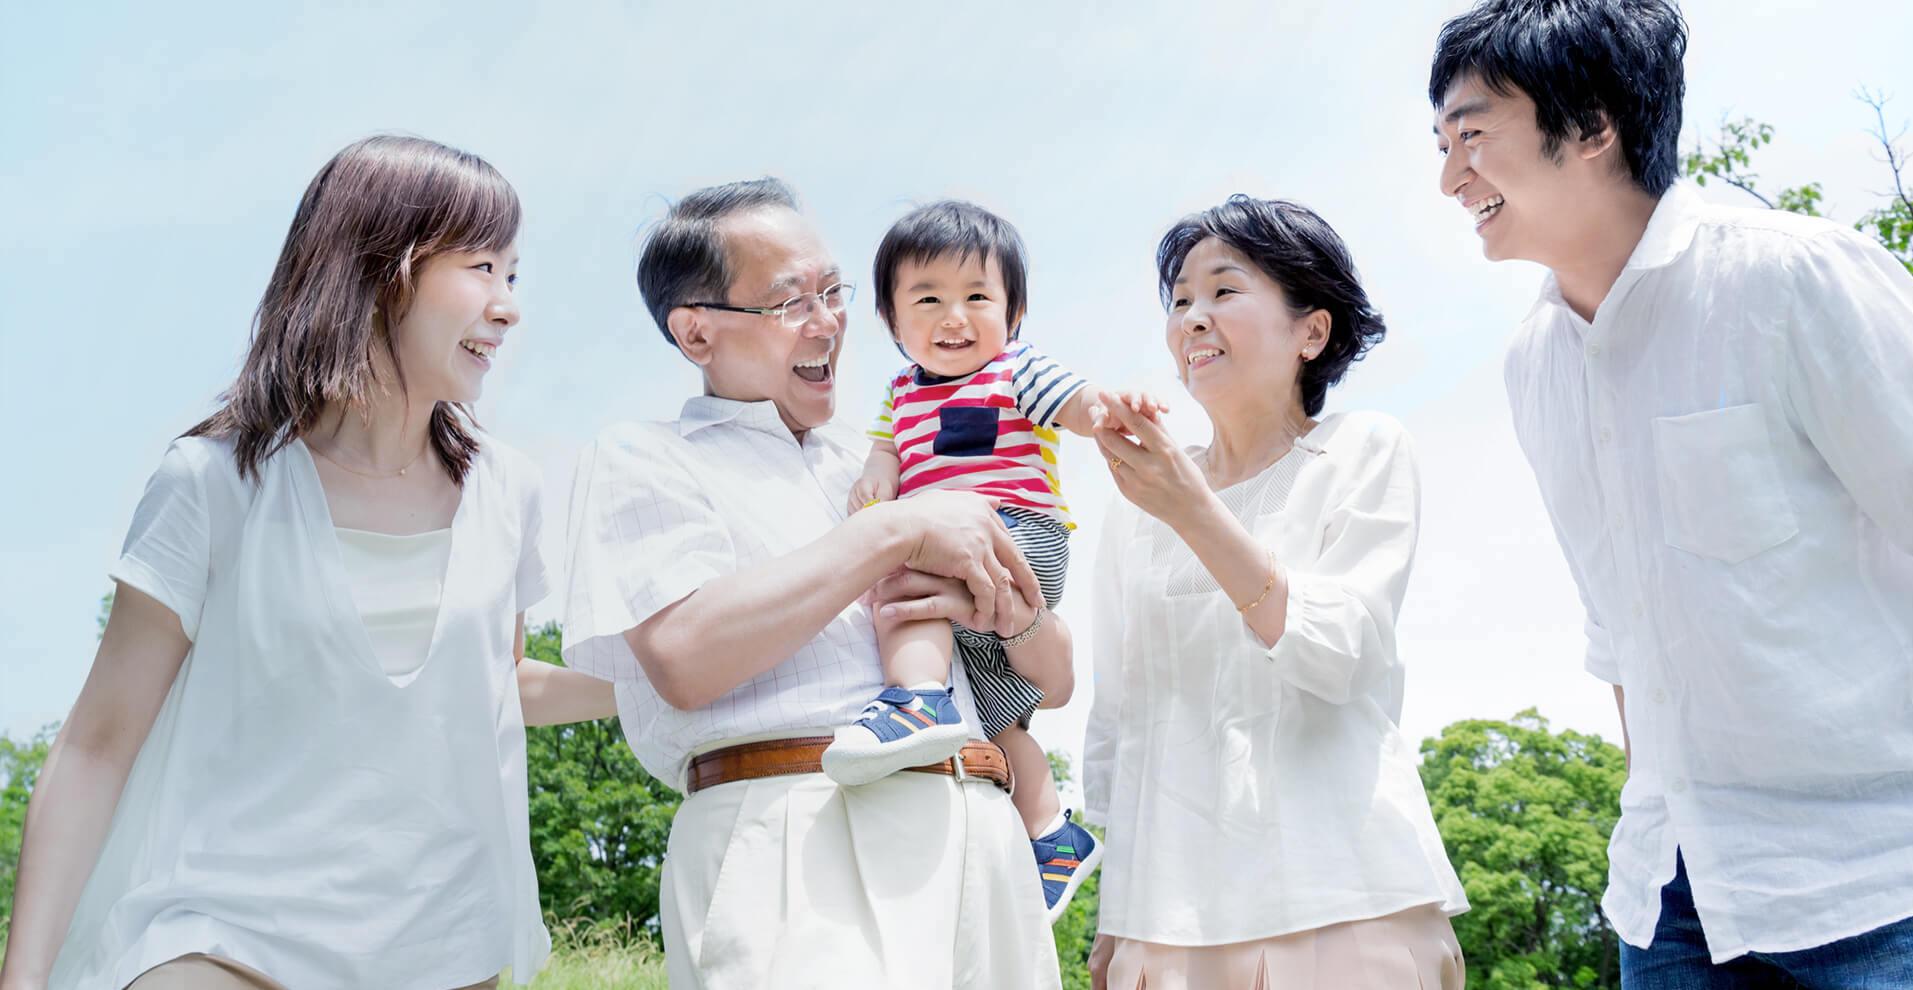 LINEを活用して家族・親族への想いを遺す終活支援サービス